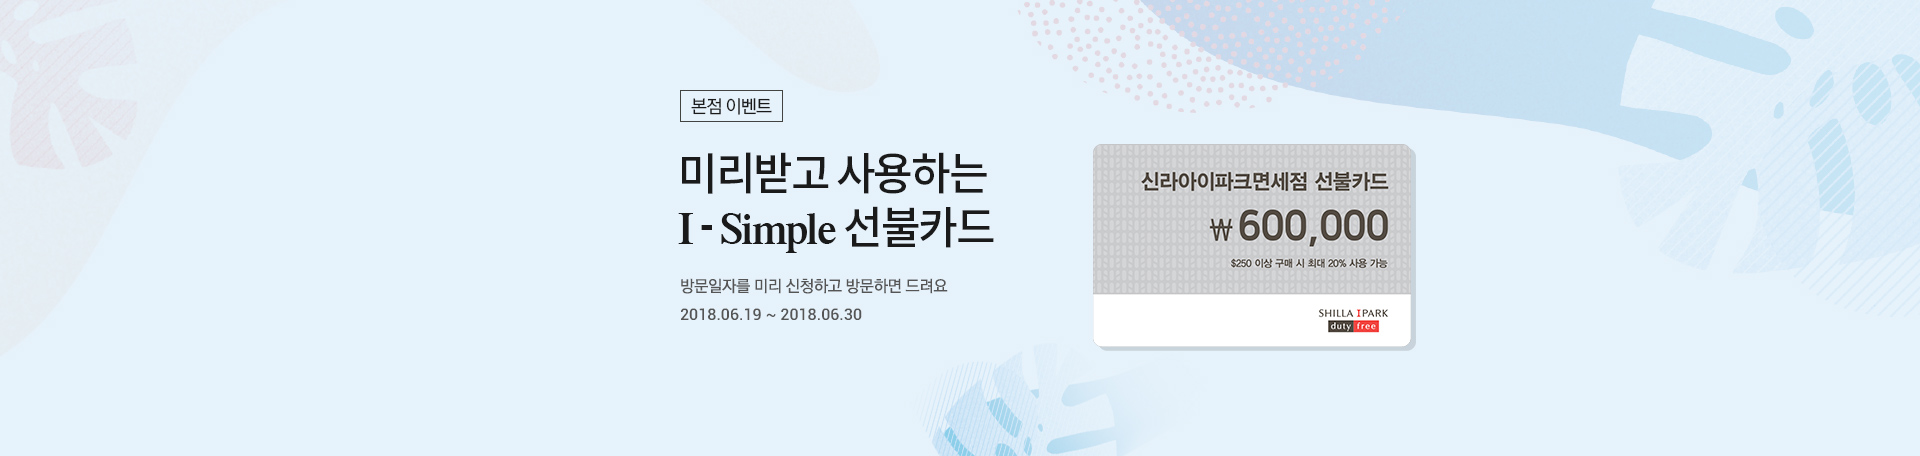 I-Simple 선불 60만원